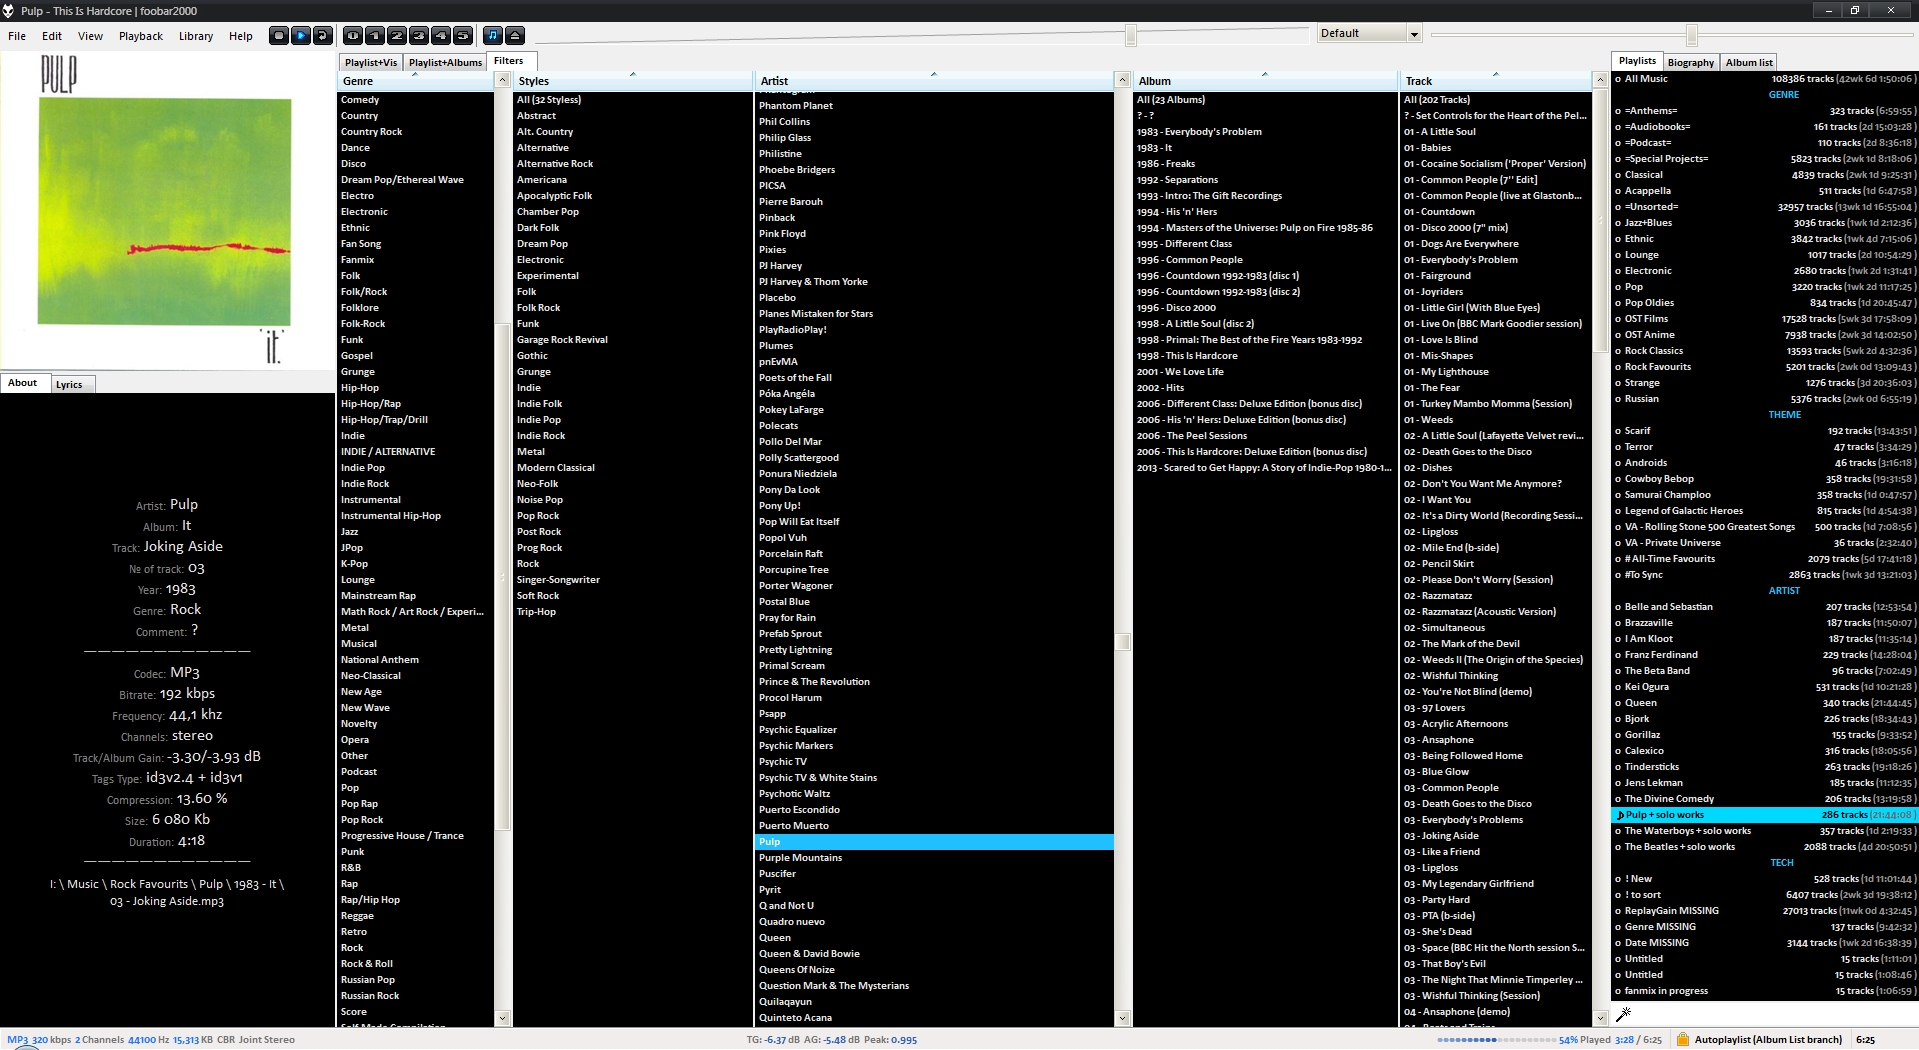 foobar2000 in 2009-2020 - filters